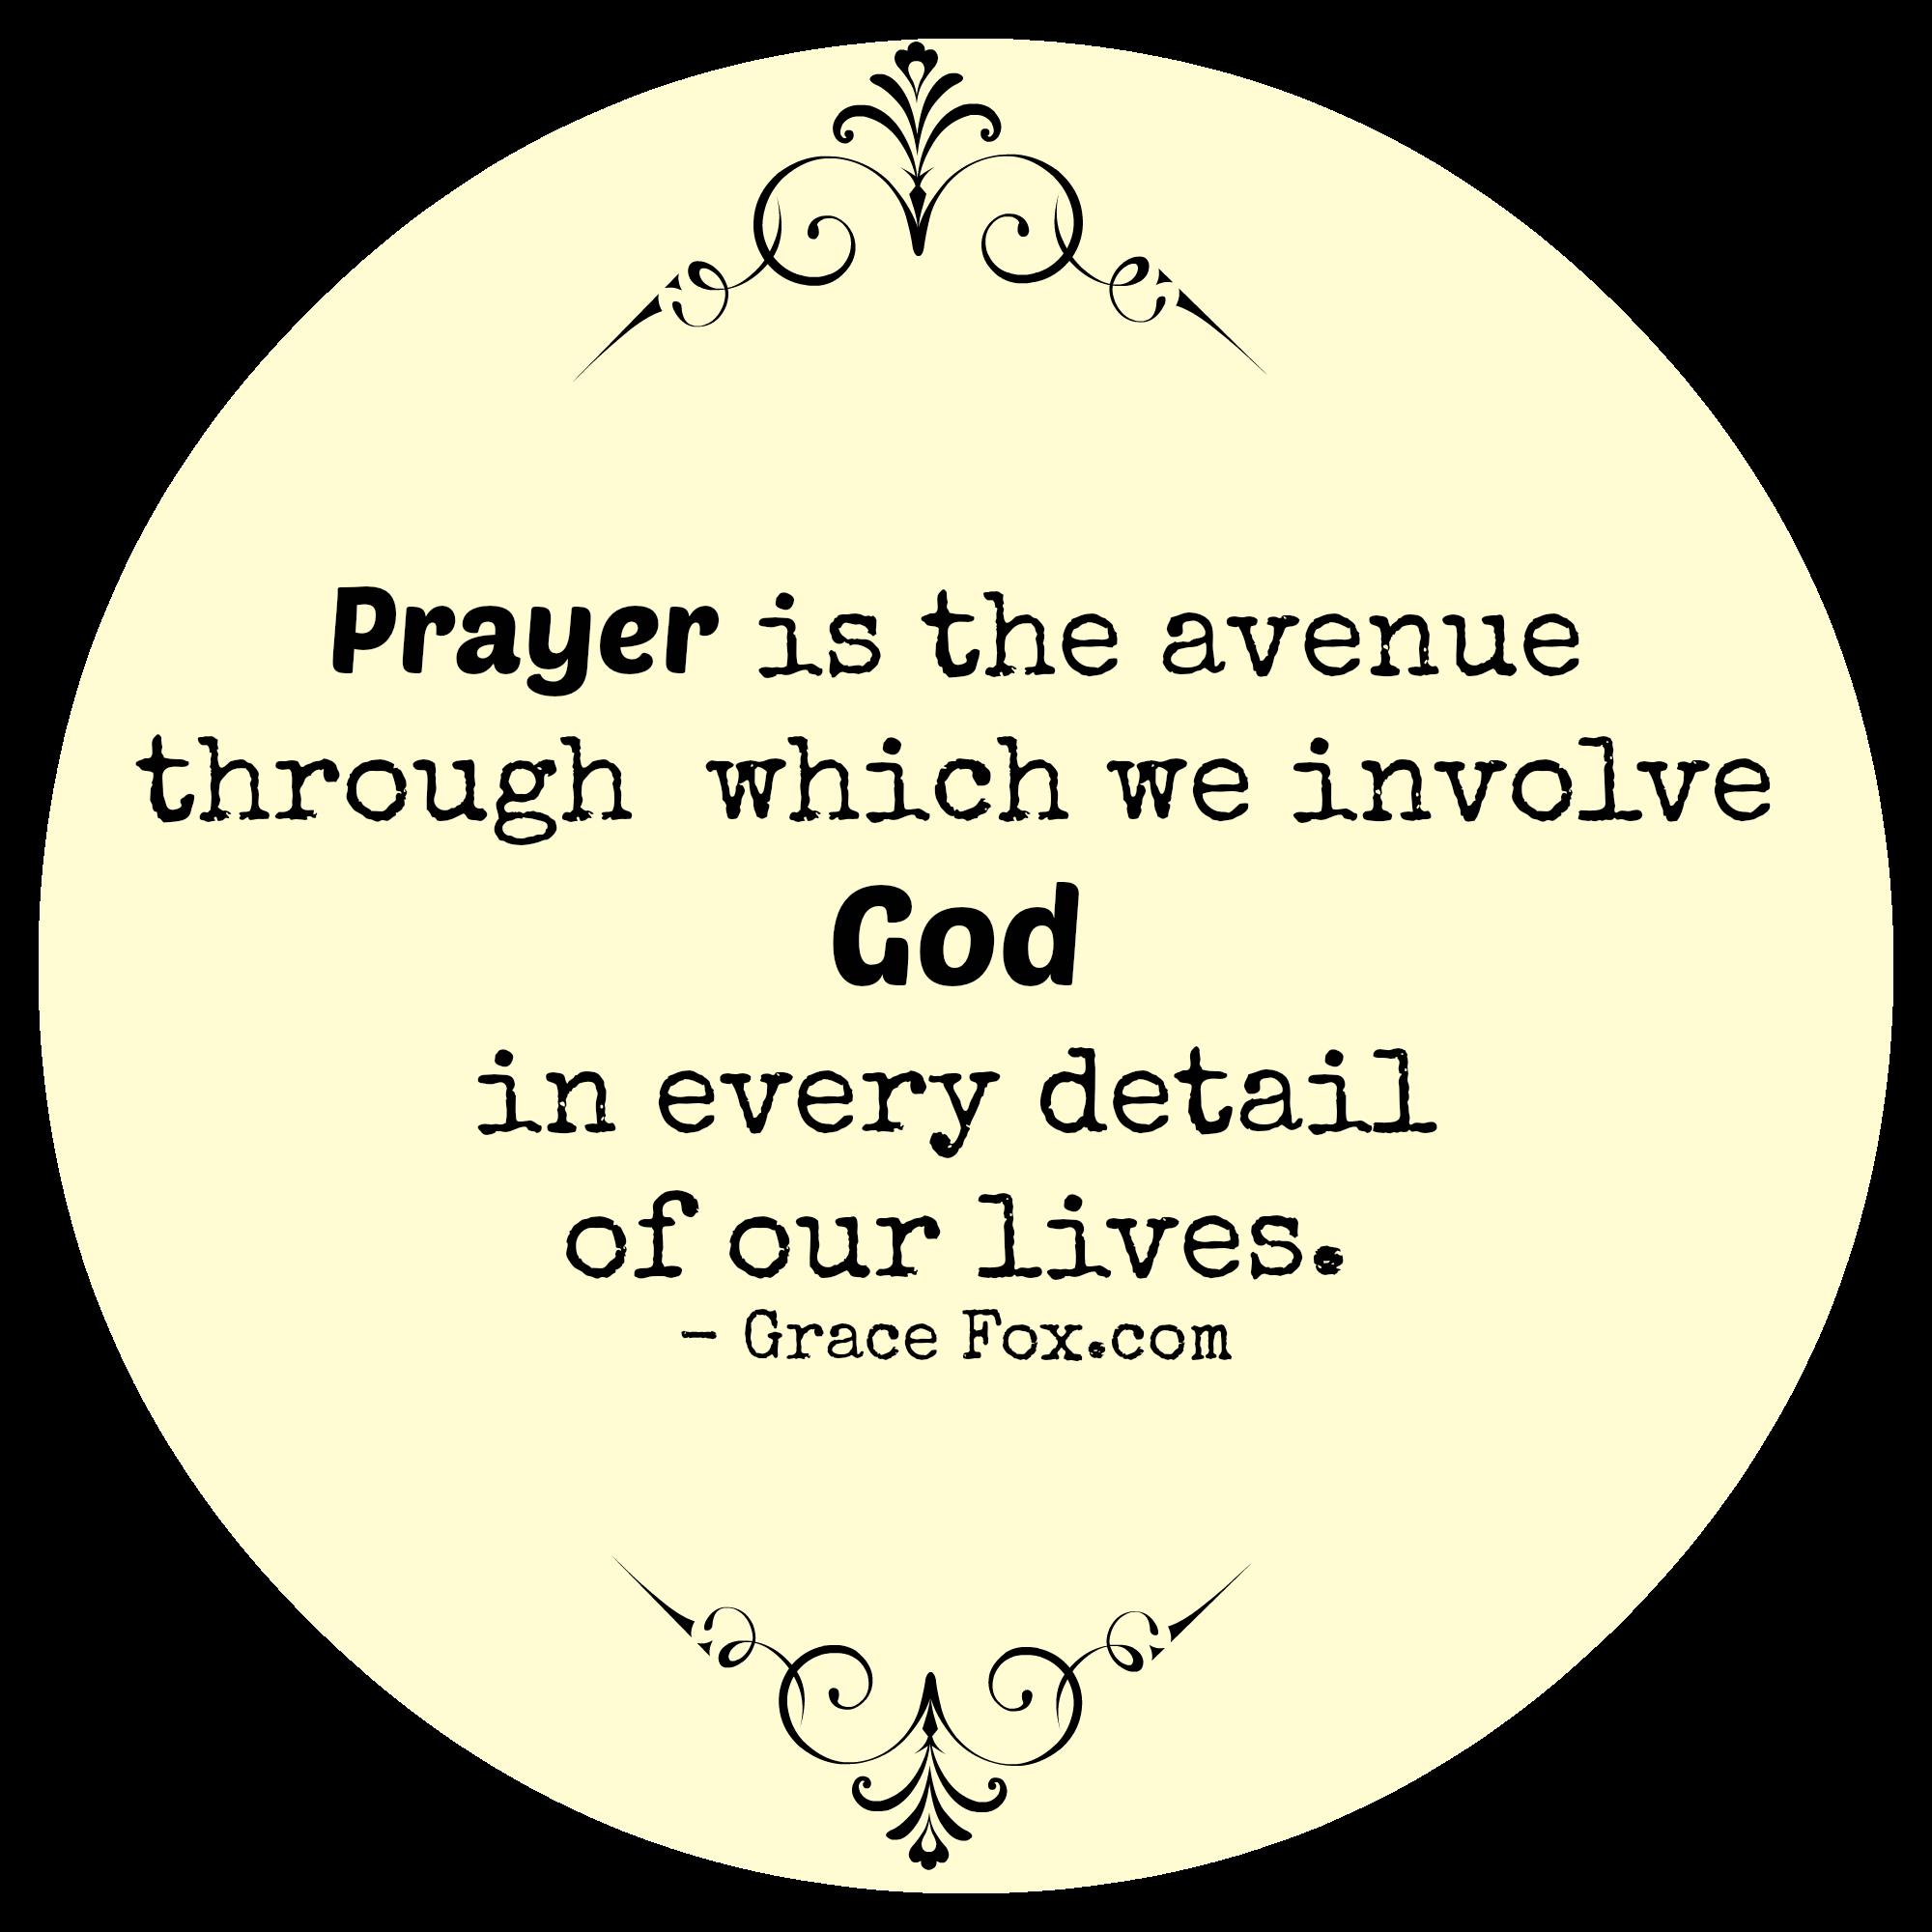 prayer is the avenue